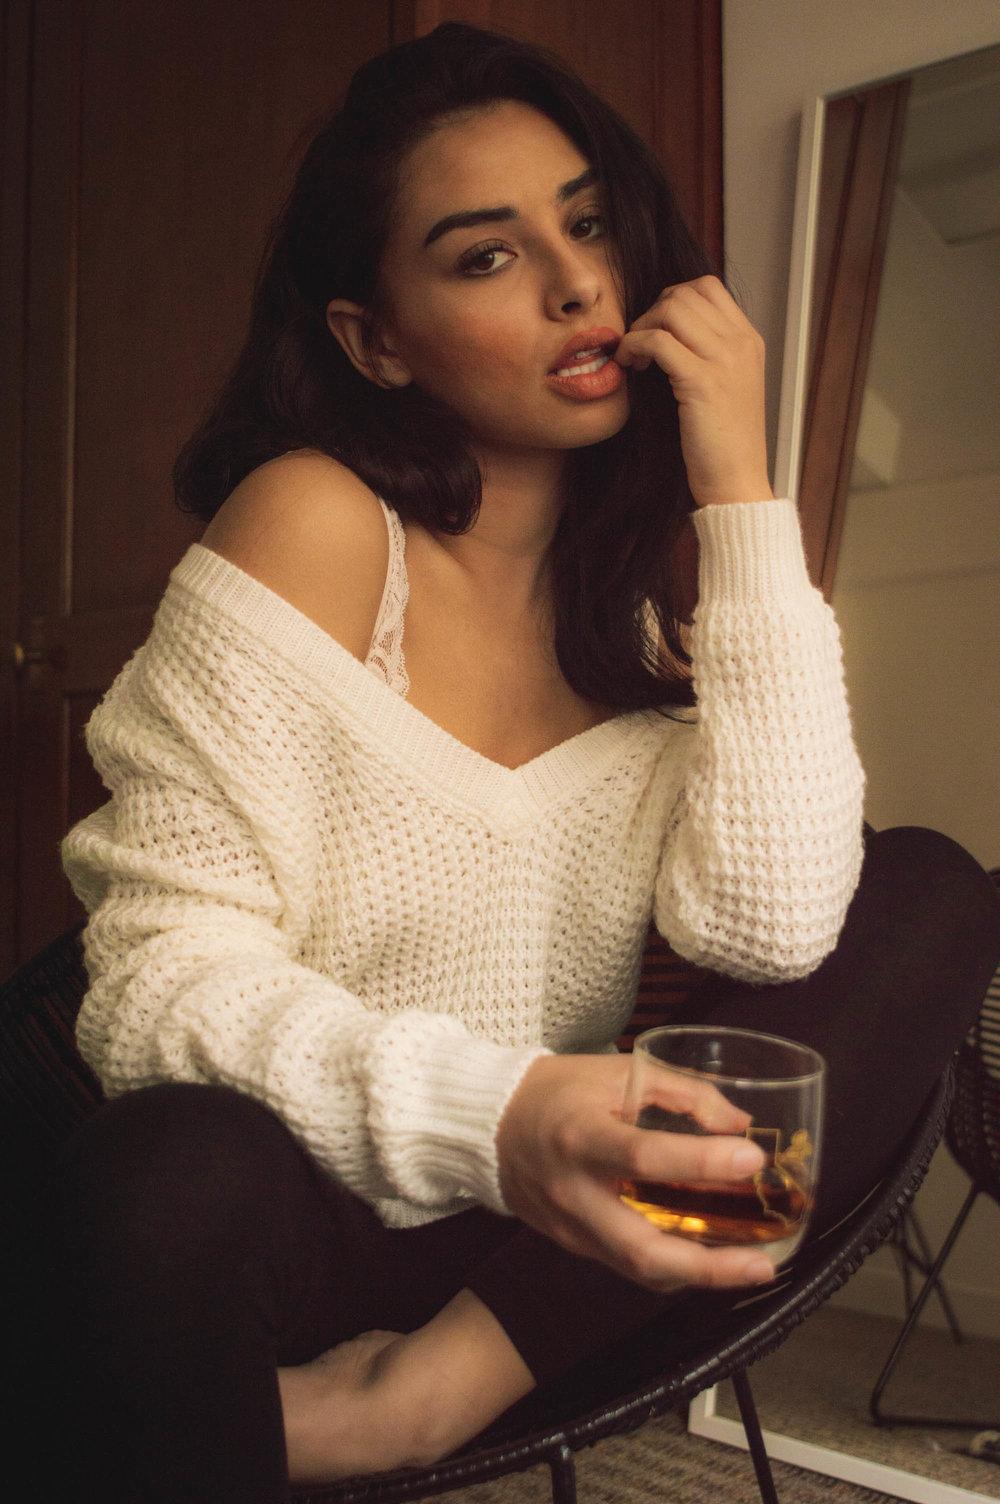 Jennifer-Morris-Crown-Royal-8.jpg